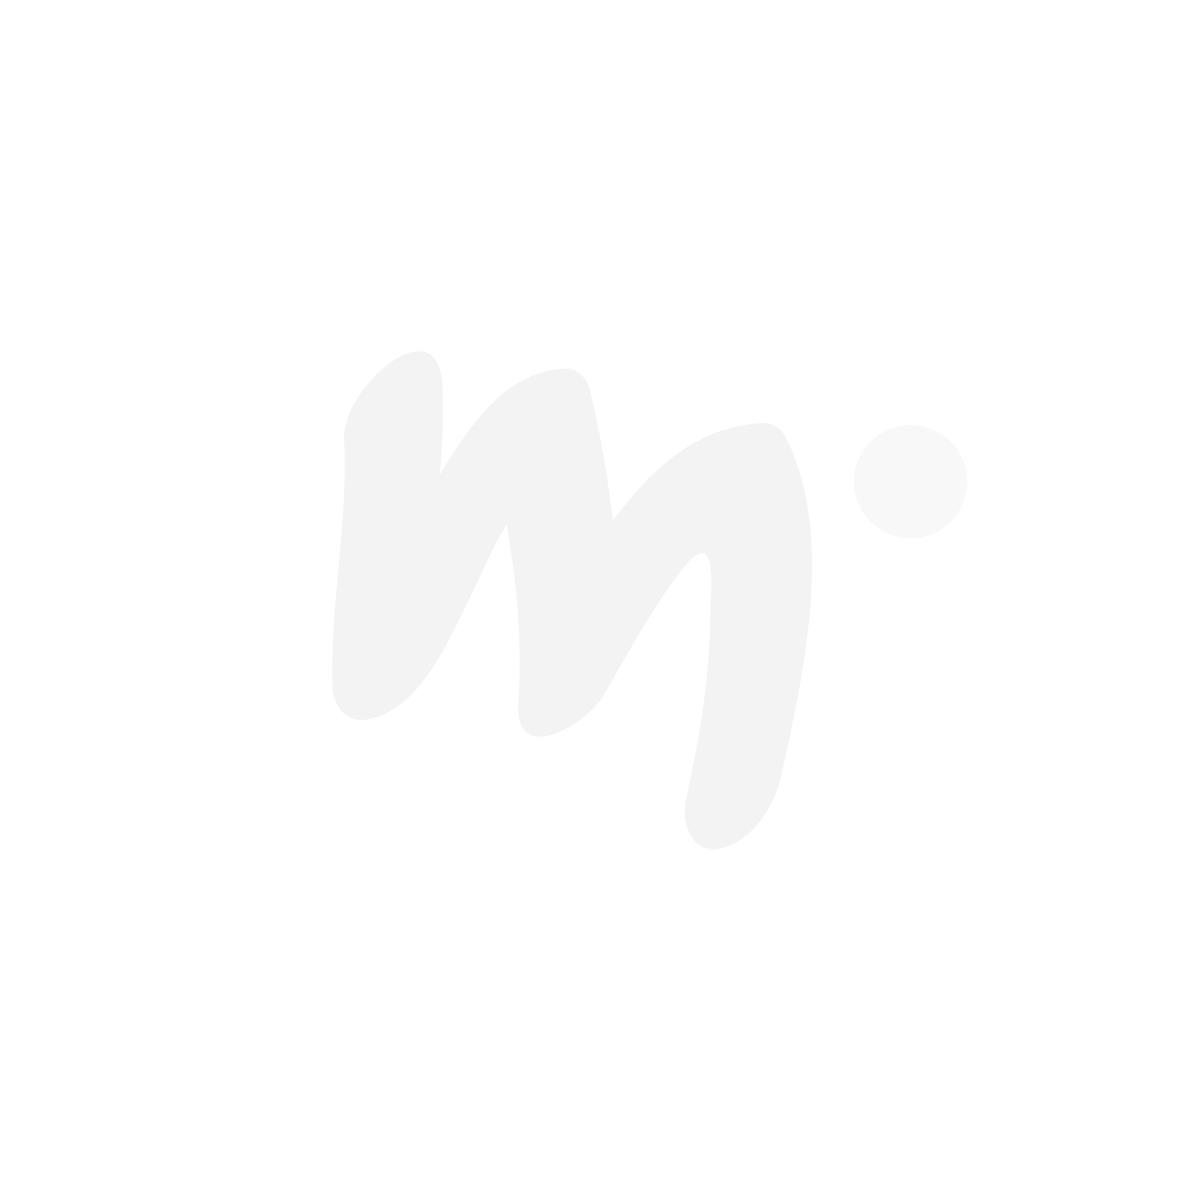 Muumi Puuhat-paita harmaa